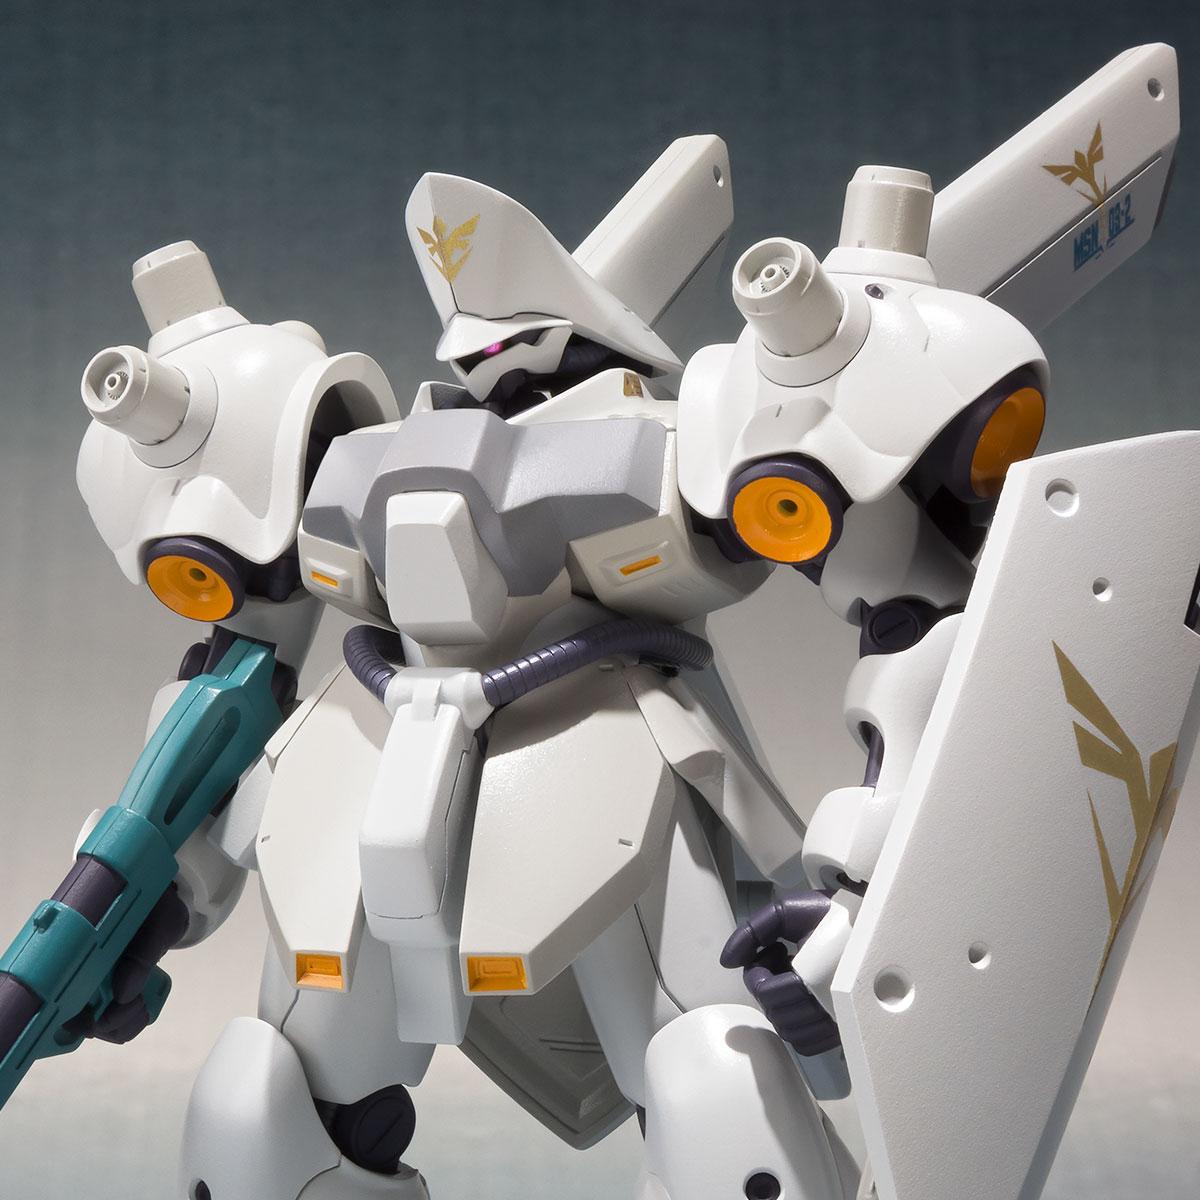 BANDAI Premium Robot Spirit SIDE MS Psycho Doga Action Figure